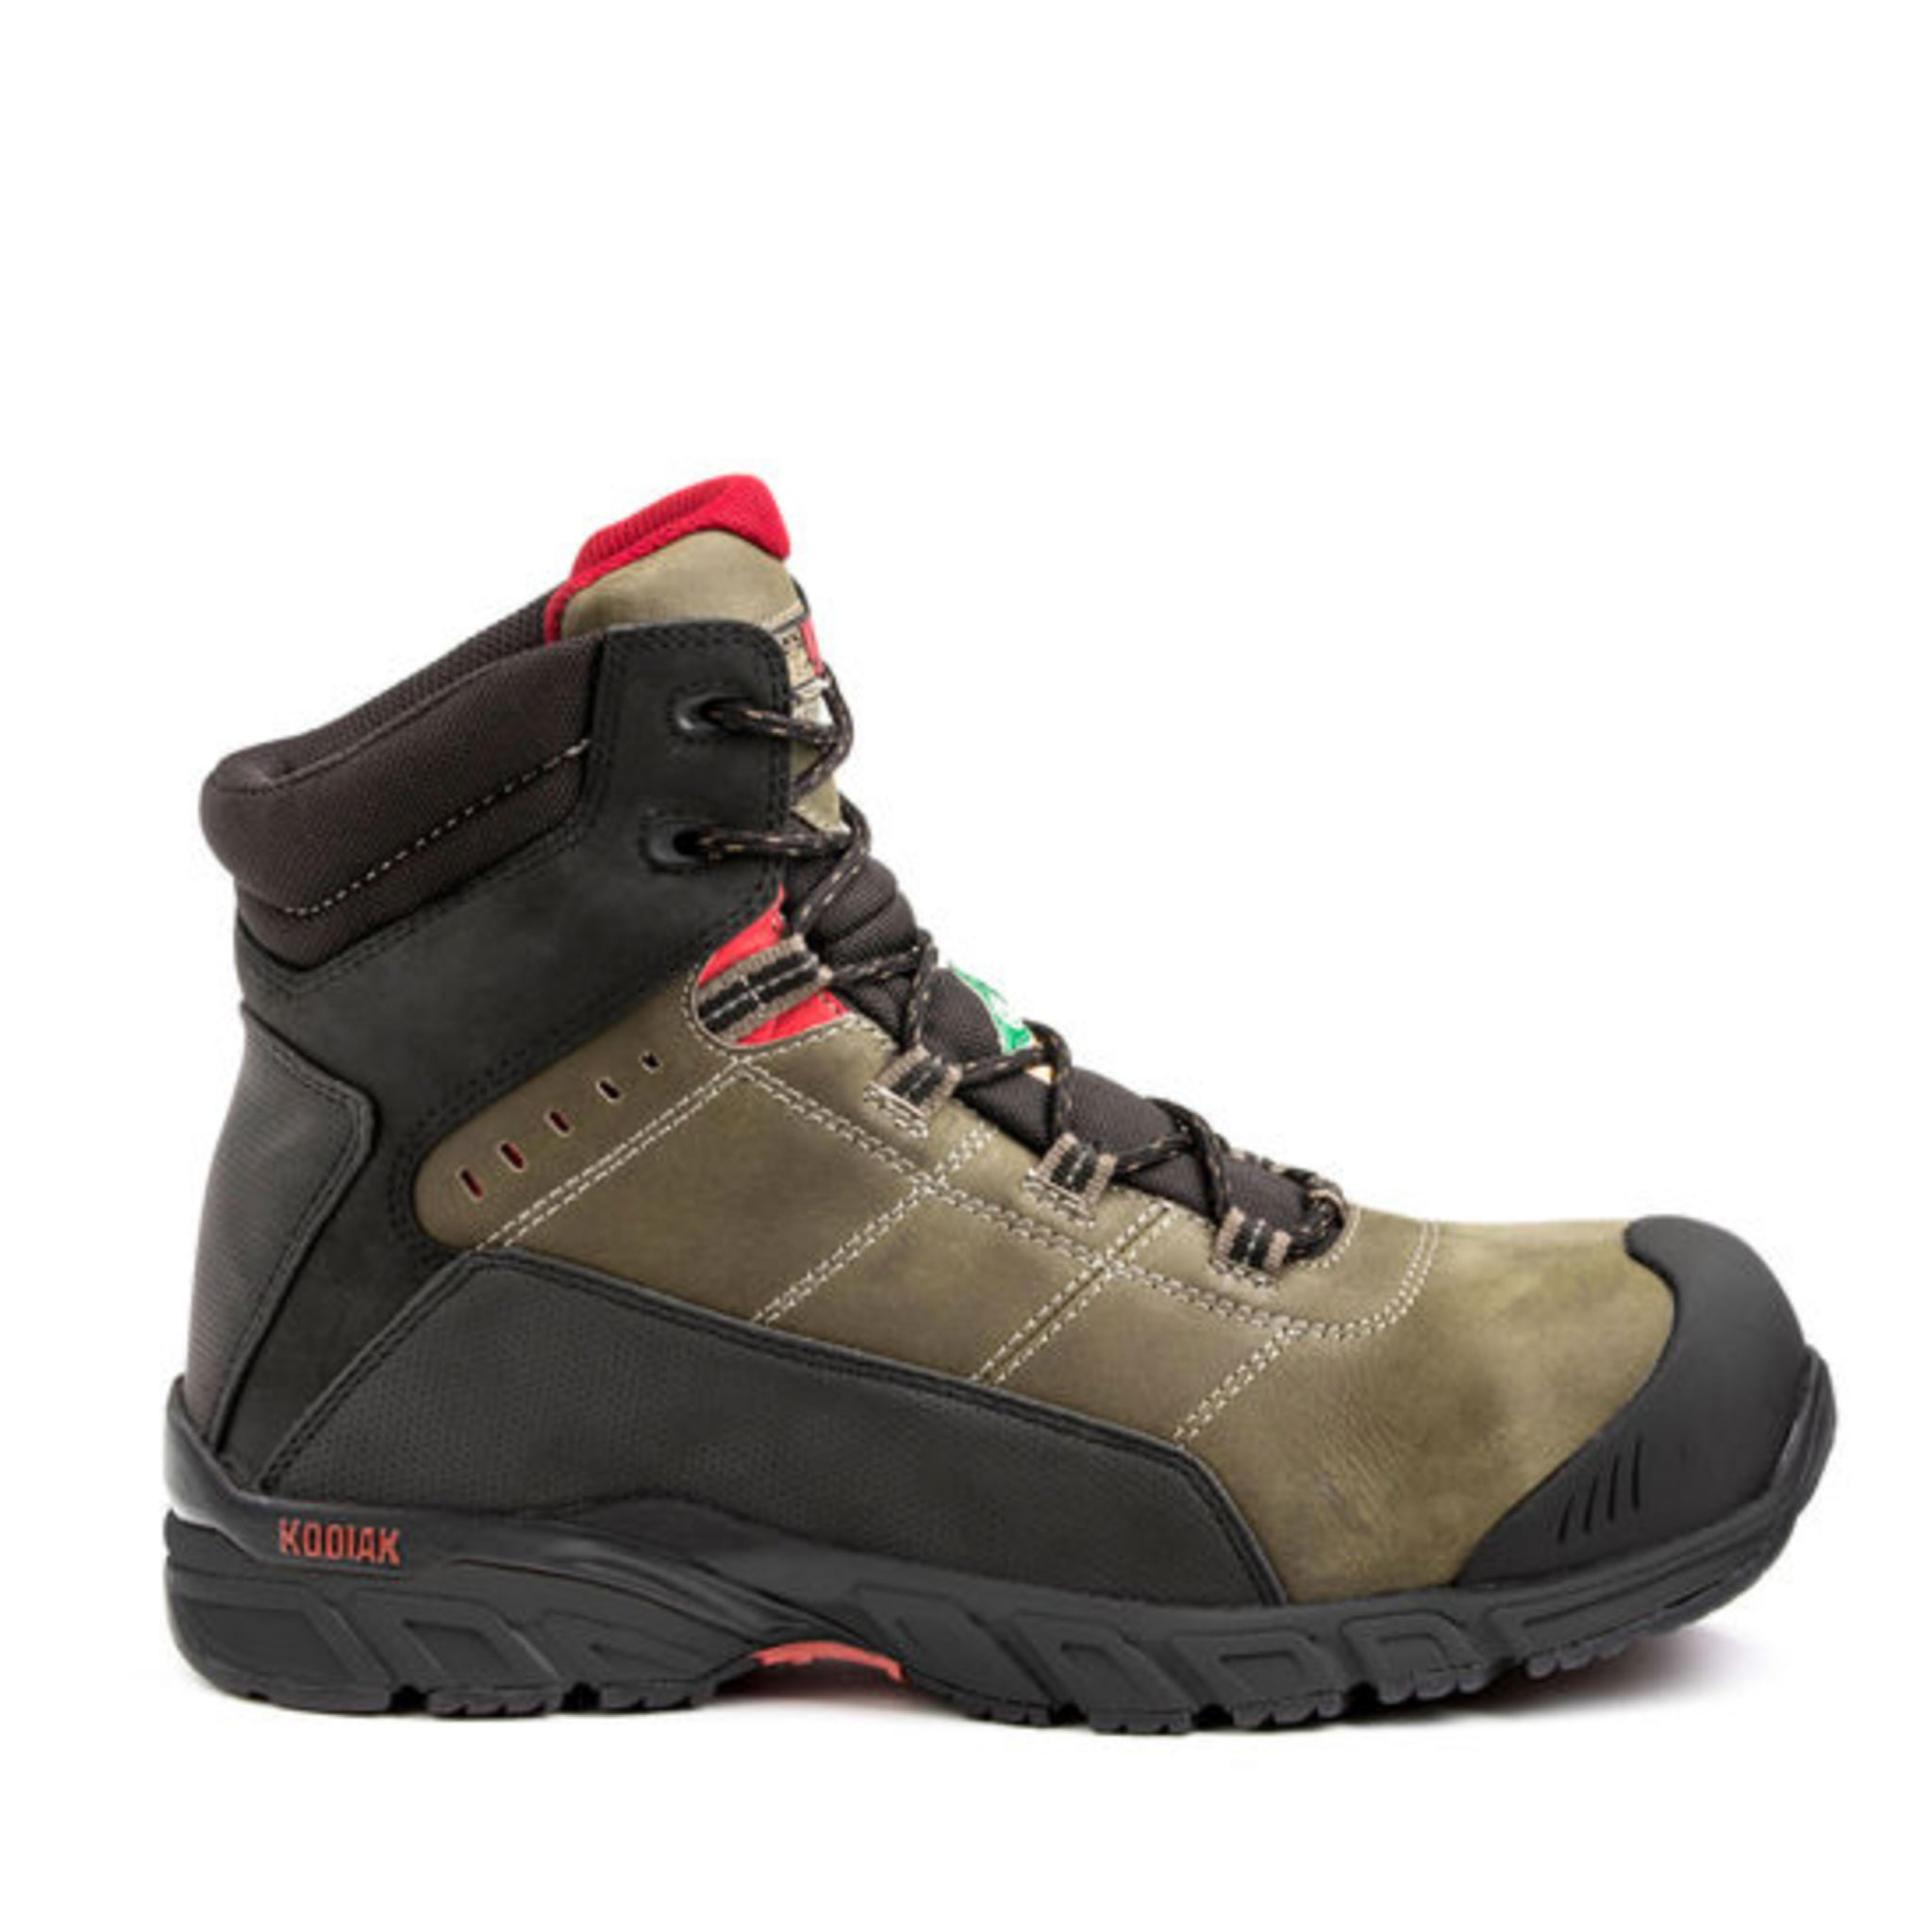 Kodiak Men's K4-Trail Boot in Army, 9.5 US - image 2 of 2